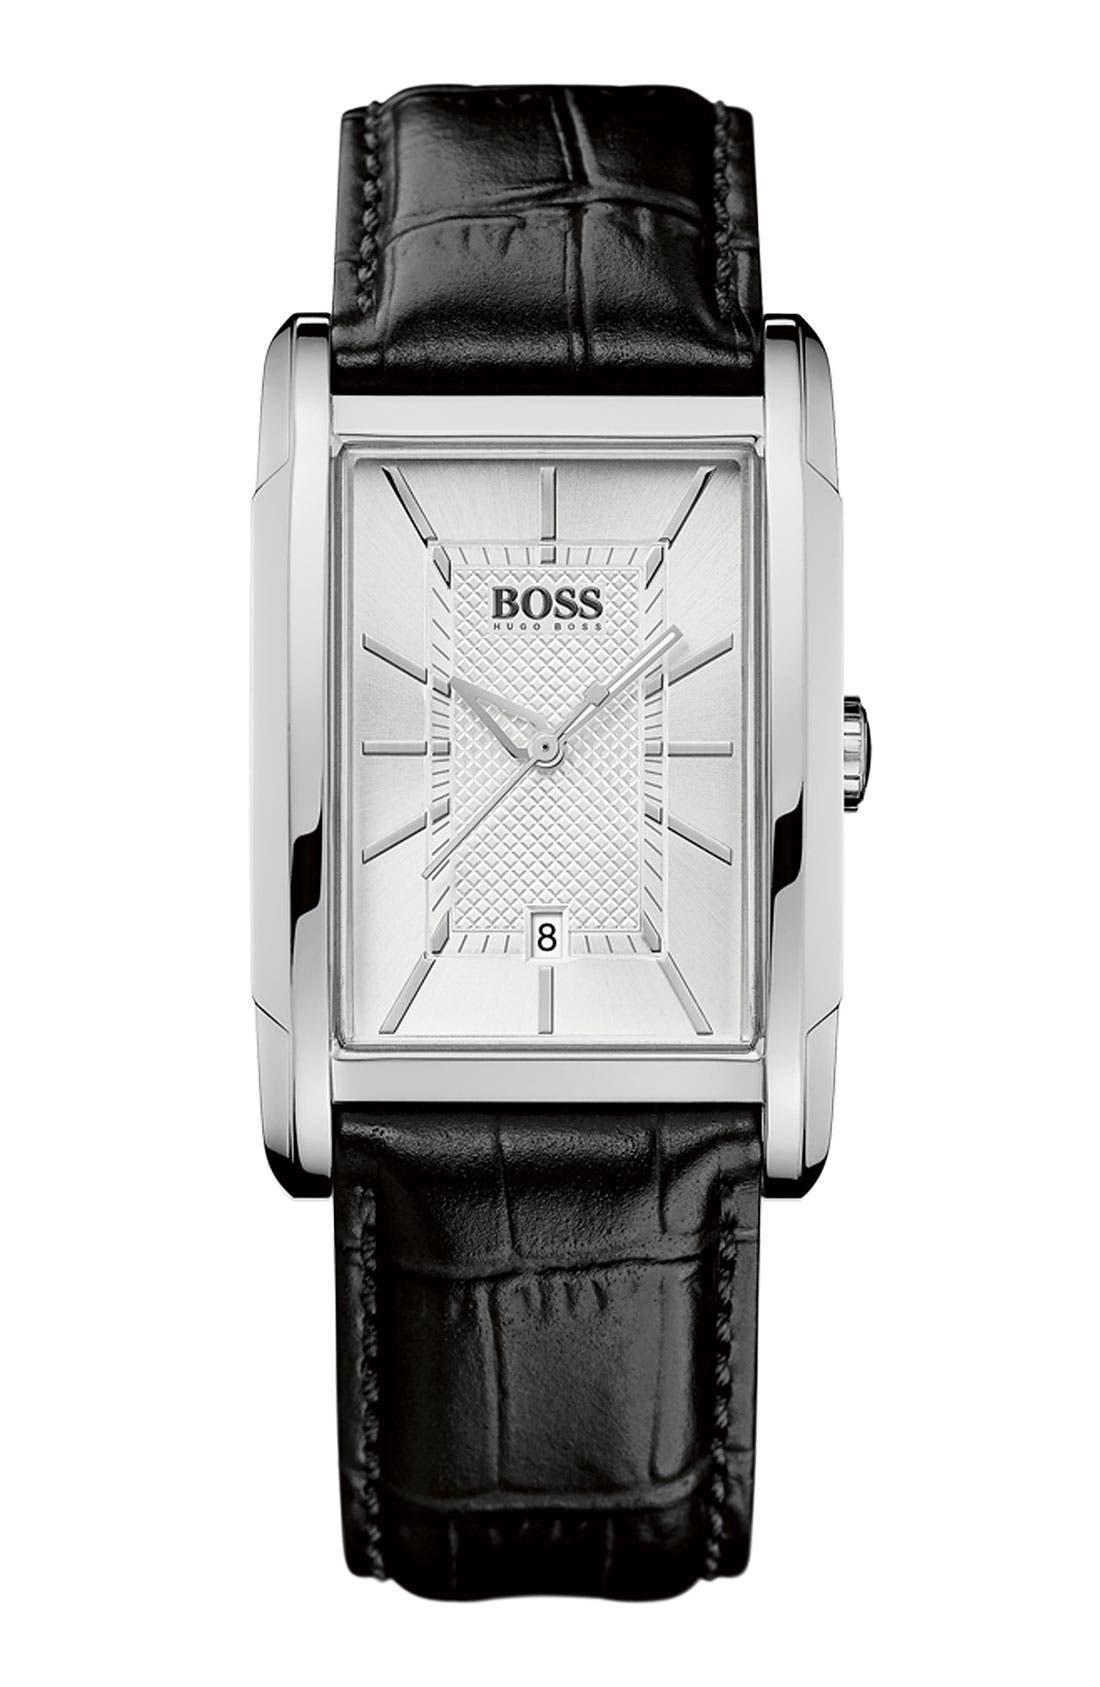 Main Image - BOSS HUGO BOSS Large Rectangular Leather Strap Watch, 30mm x 36mm